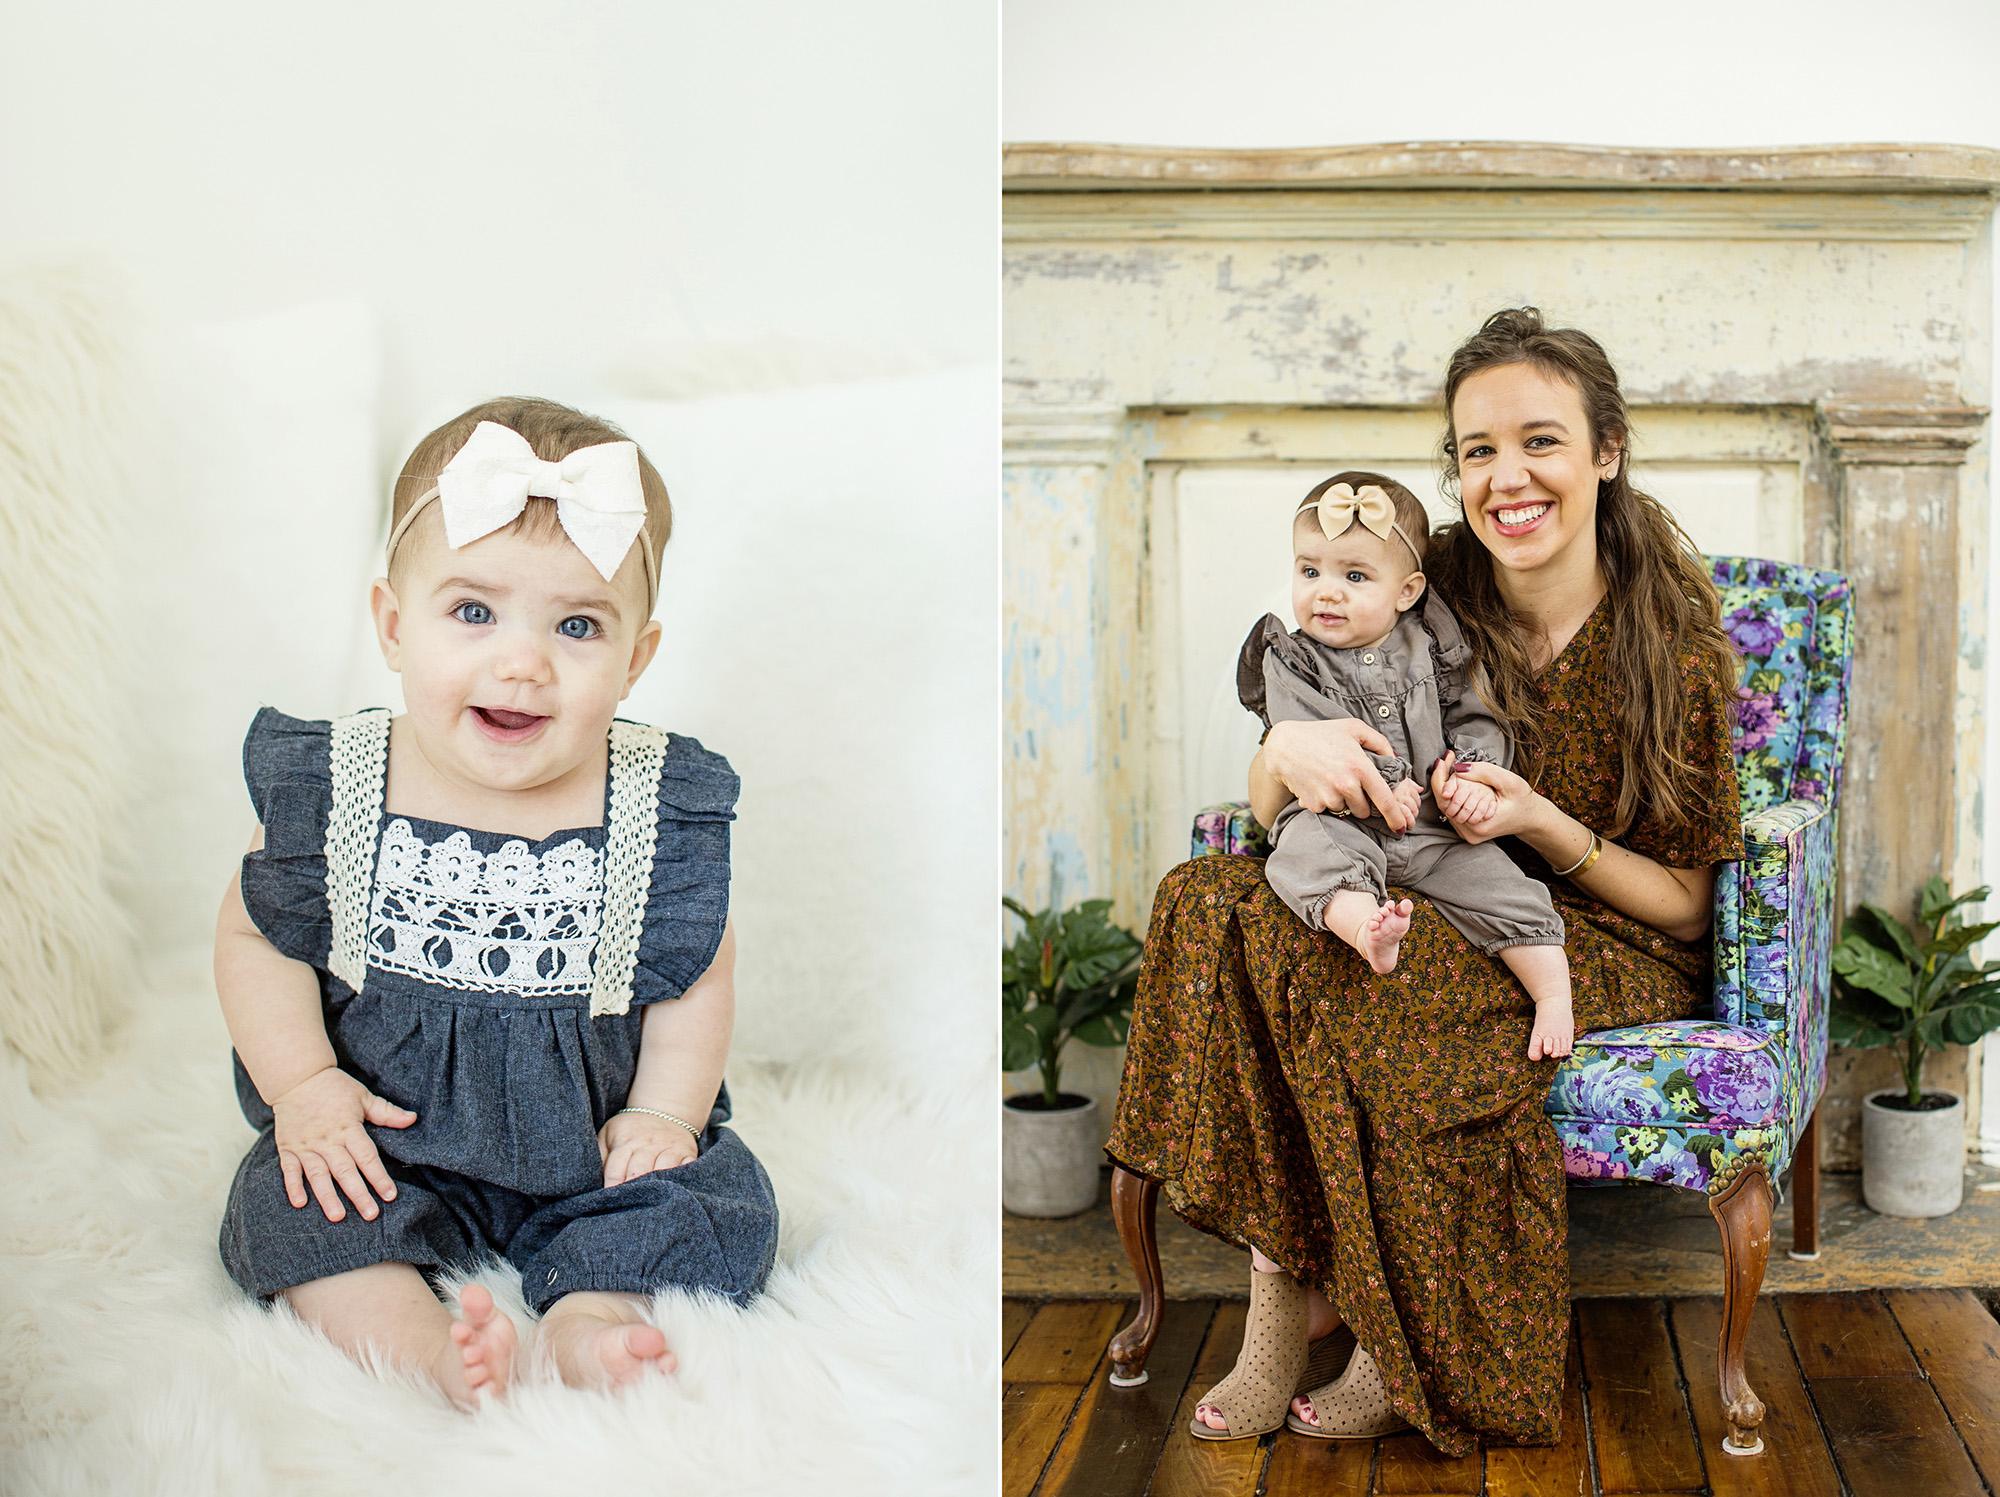 Seriously_Sabrina_Photography_Lexington_Kentucky_Studio_Lex_Portraits_Family_Oyler10.jpg